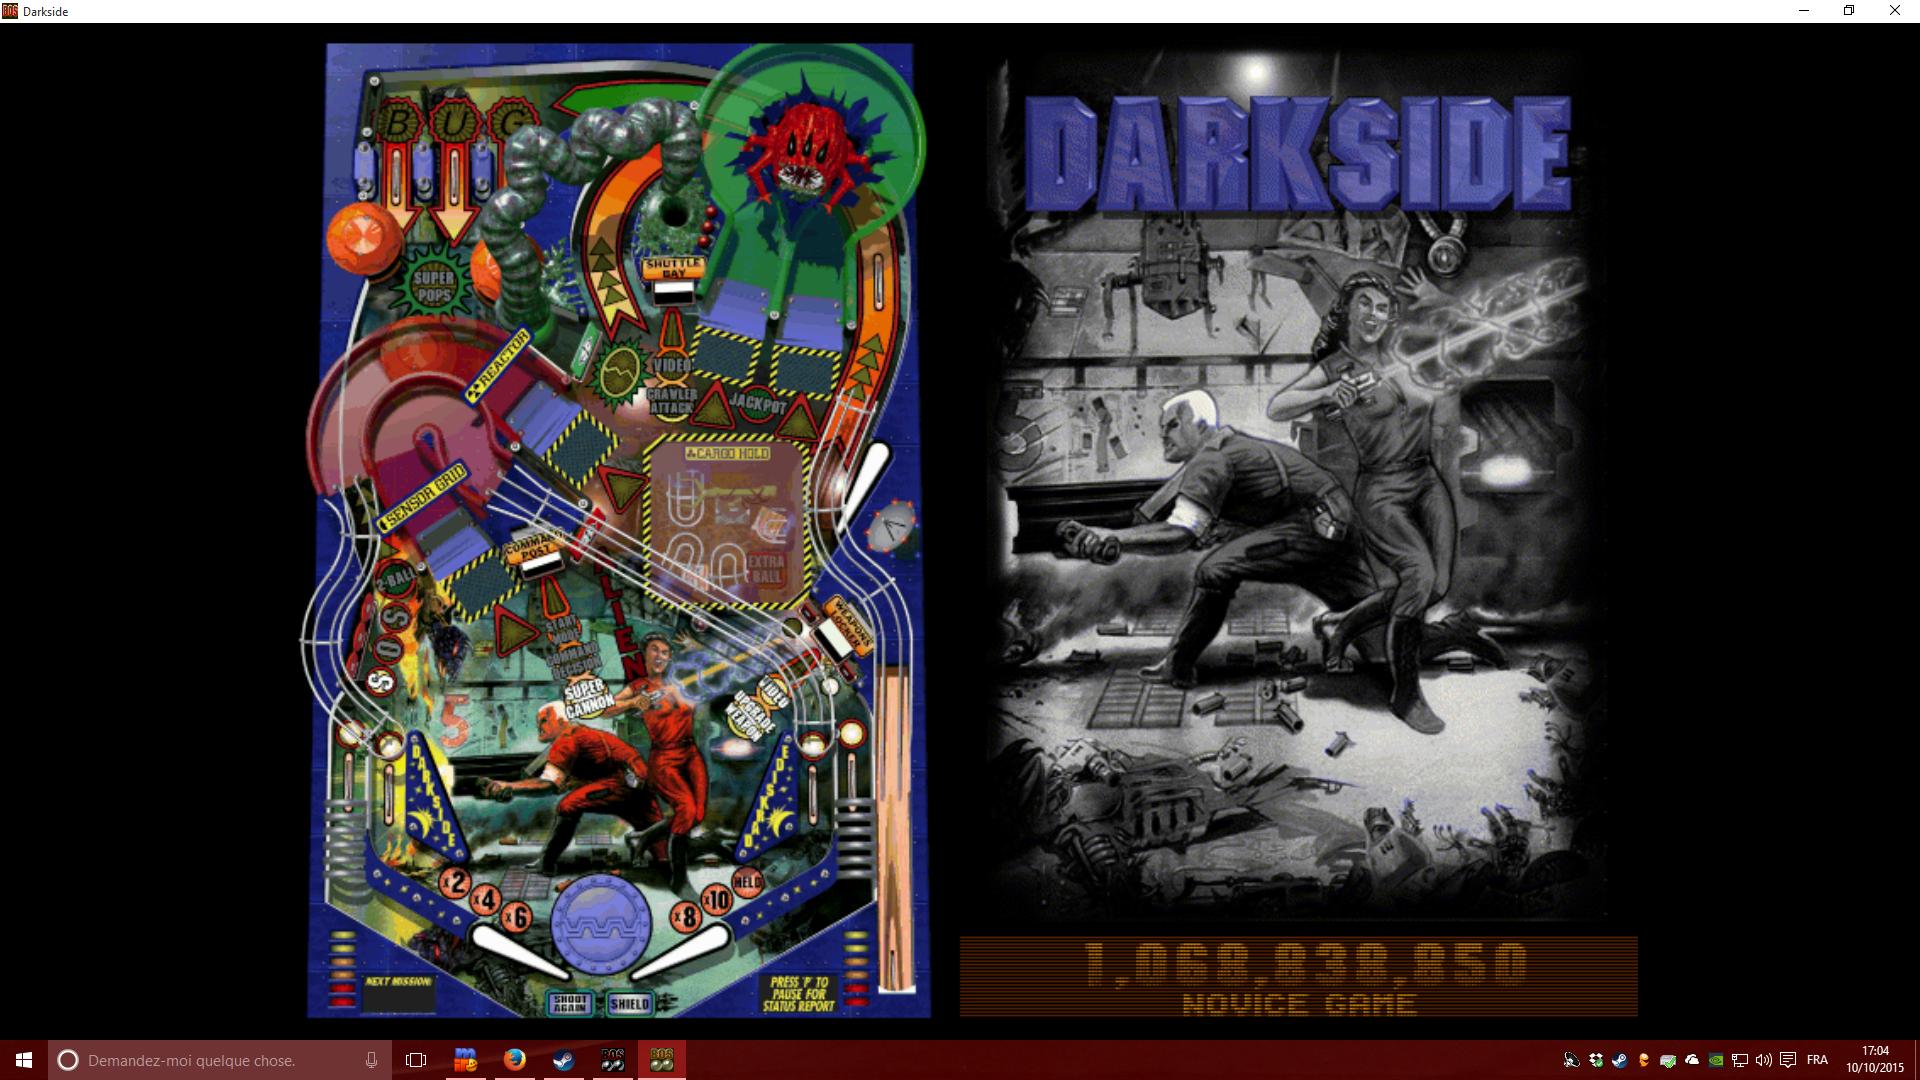 Mantalow: Balls of Steel: Darkside [Novice] (PC) 1,068,838,850 points on 2015-10-10 11:22:21